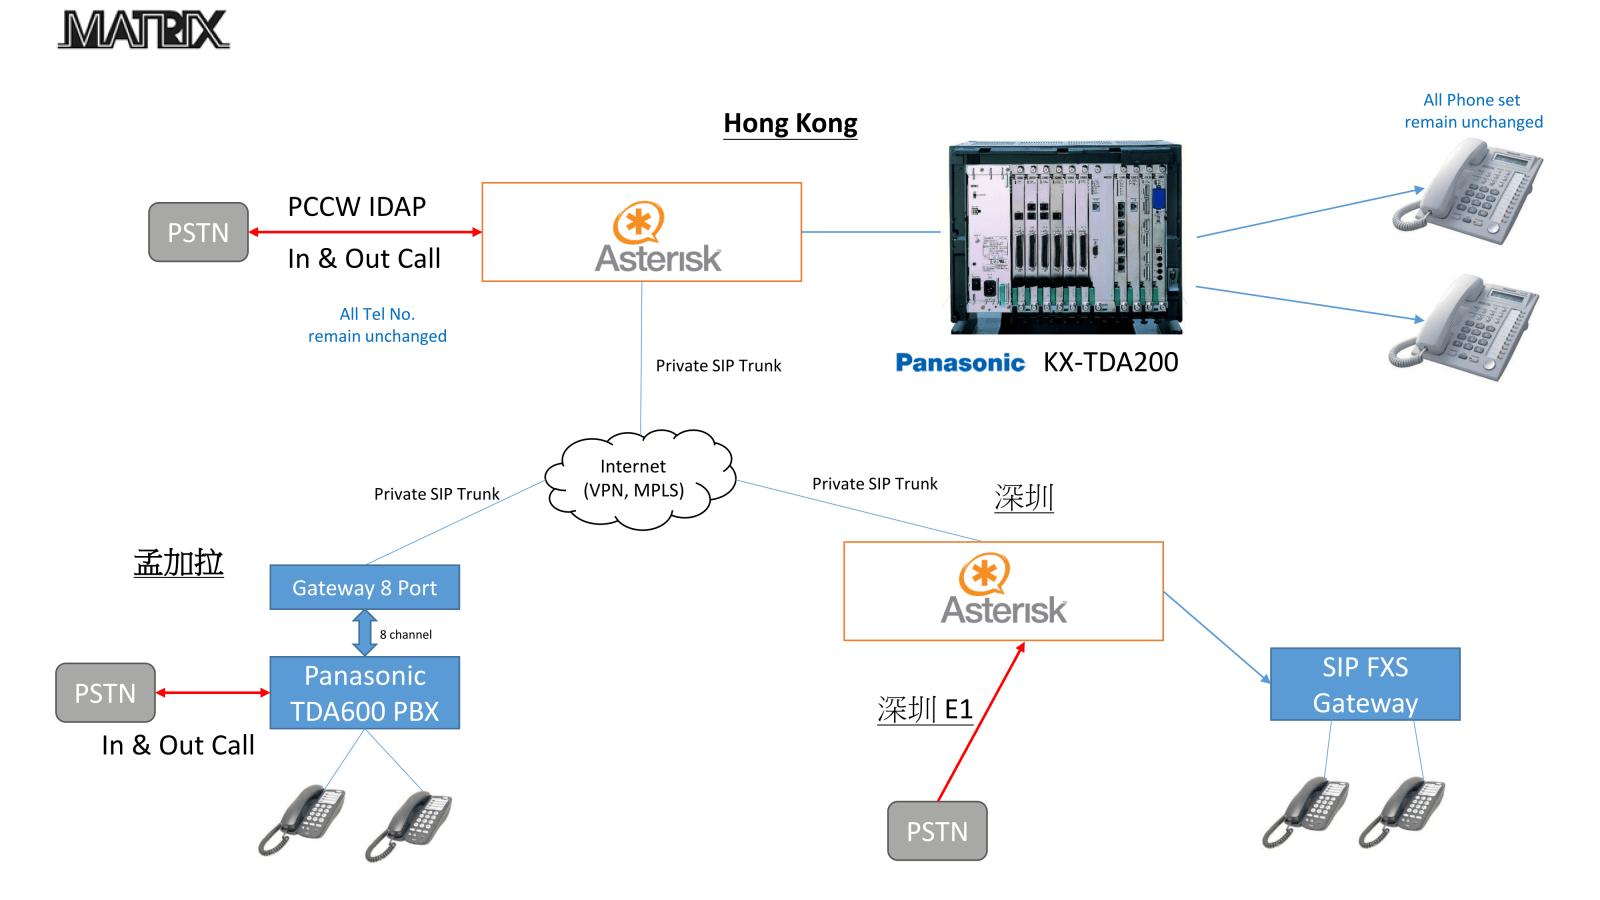 IPPBX & PBX Interconnection